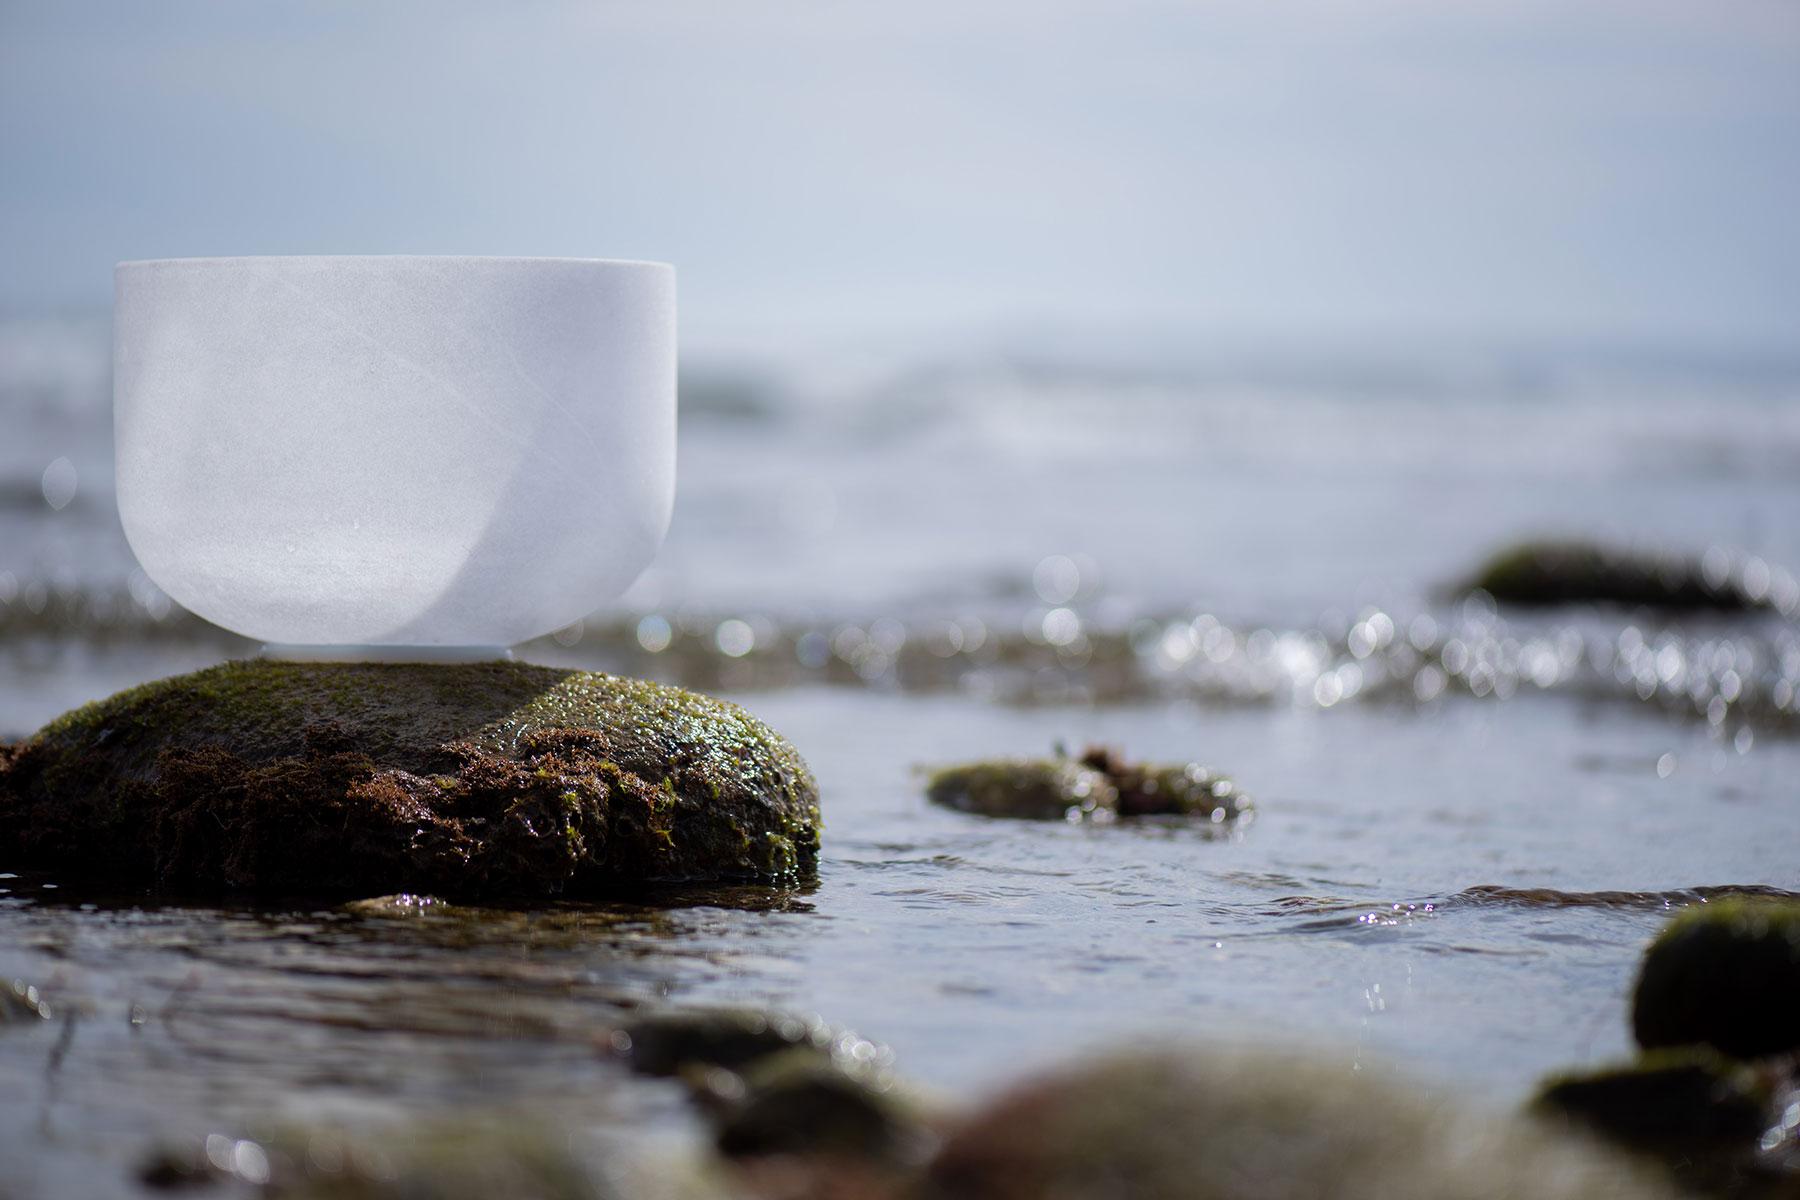 Crystal Singing Bowl By The Ocean